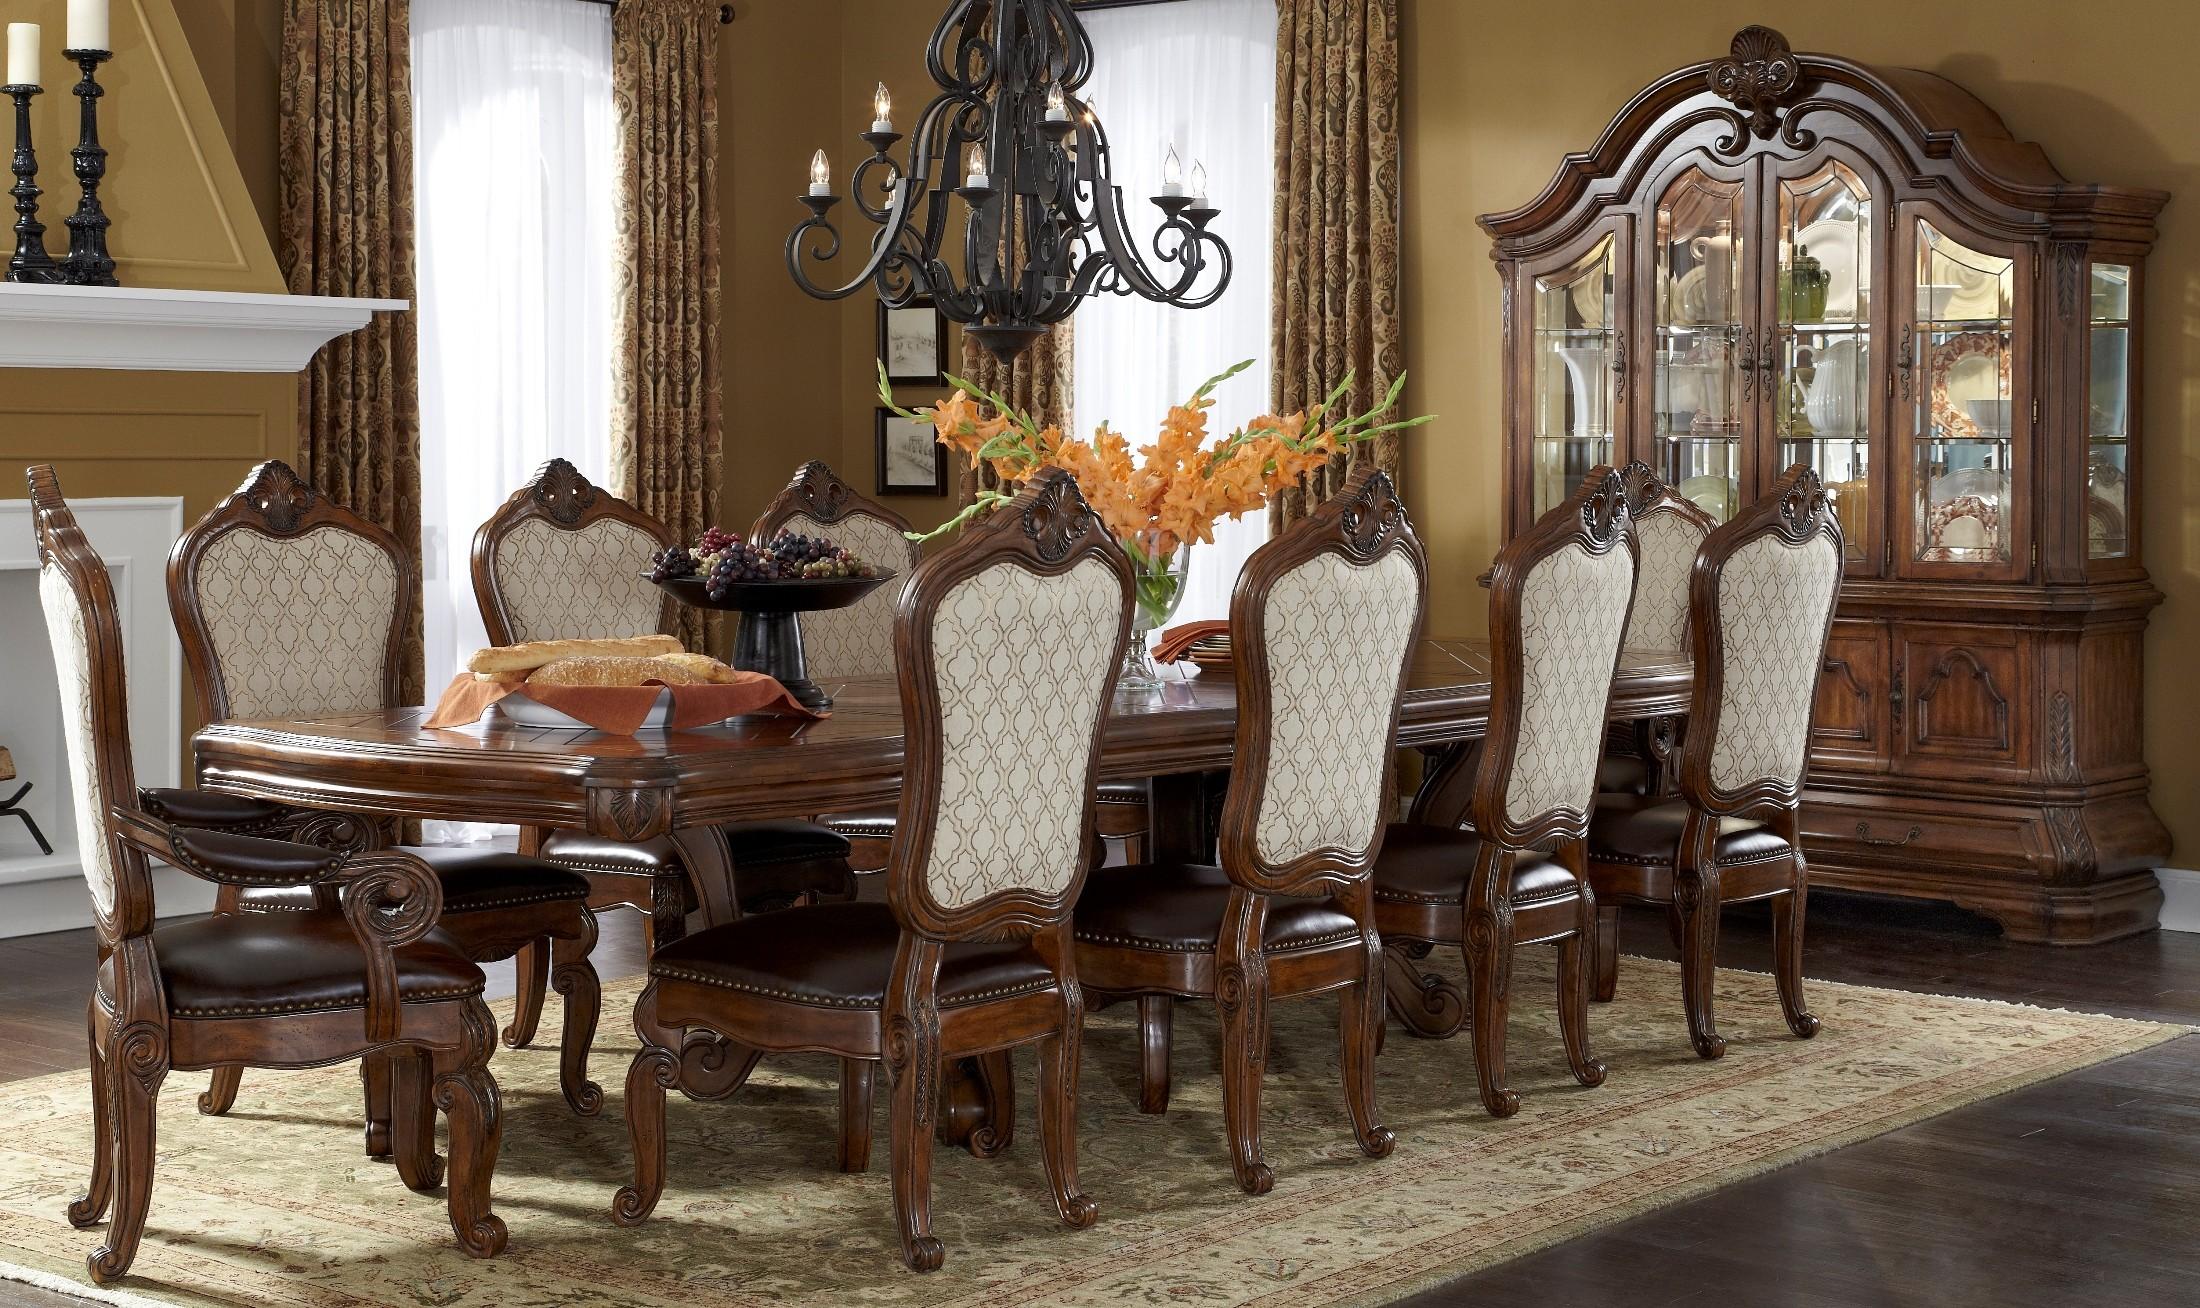 Tuscano Melange Rectangular Dining Room Set From Aico (34002 34)   Coleman  Furniture